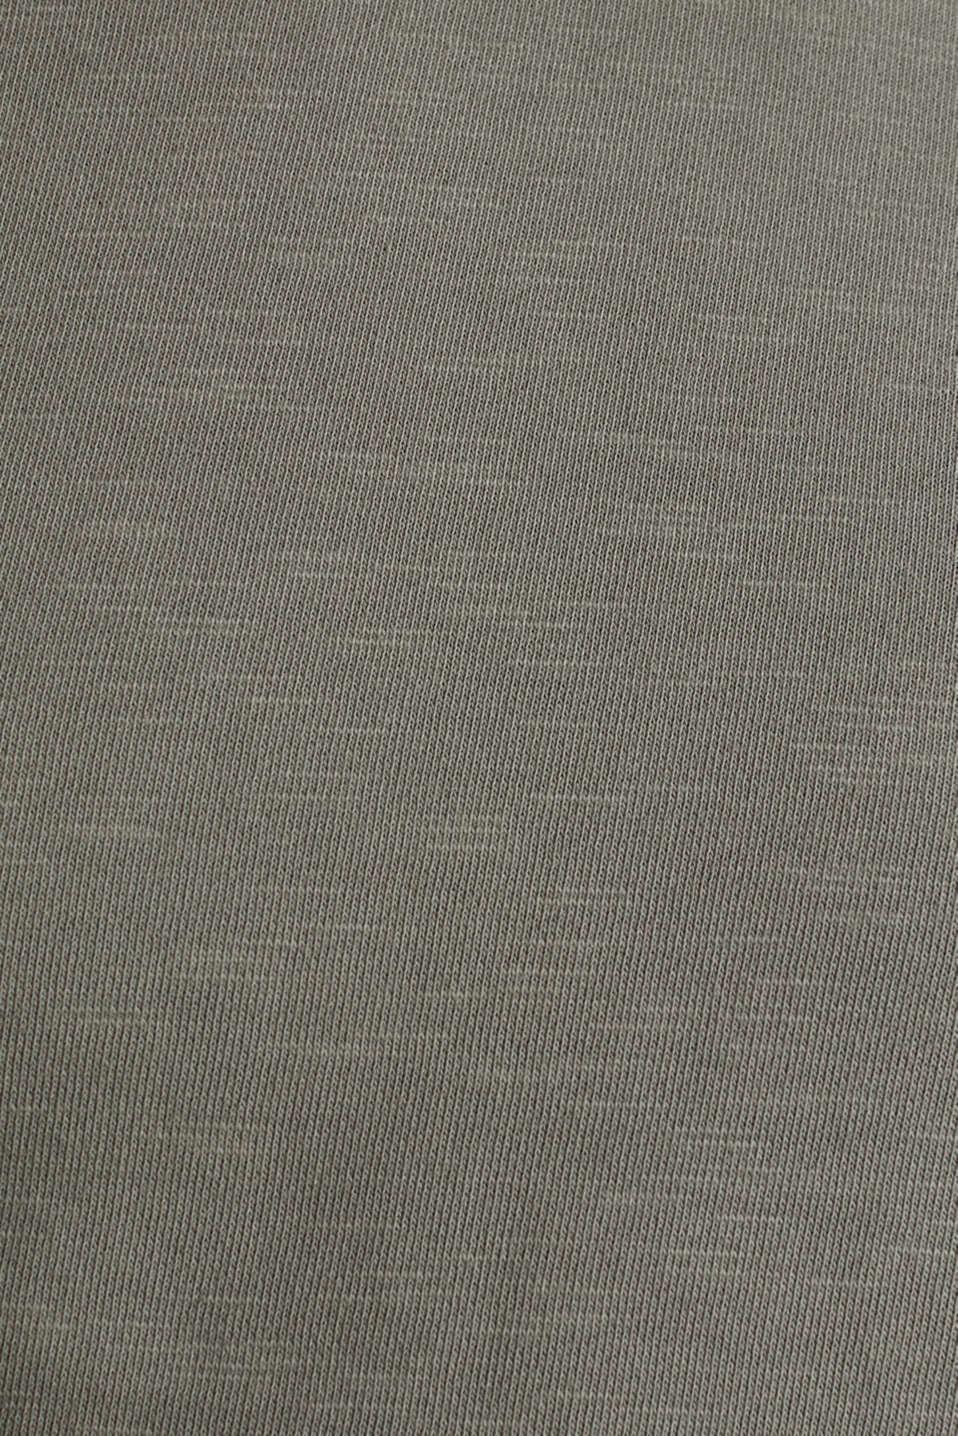 EarthColors®: cotton sweatshirt, DARK KHAKI 2, detail image number 4